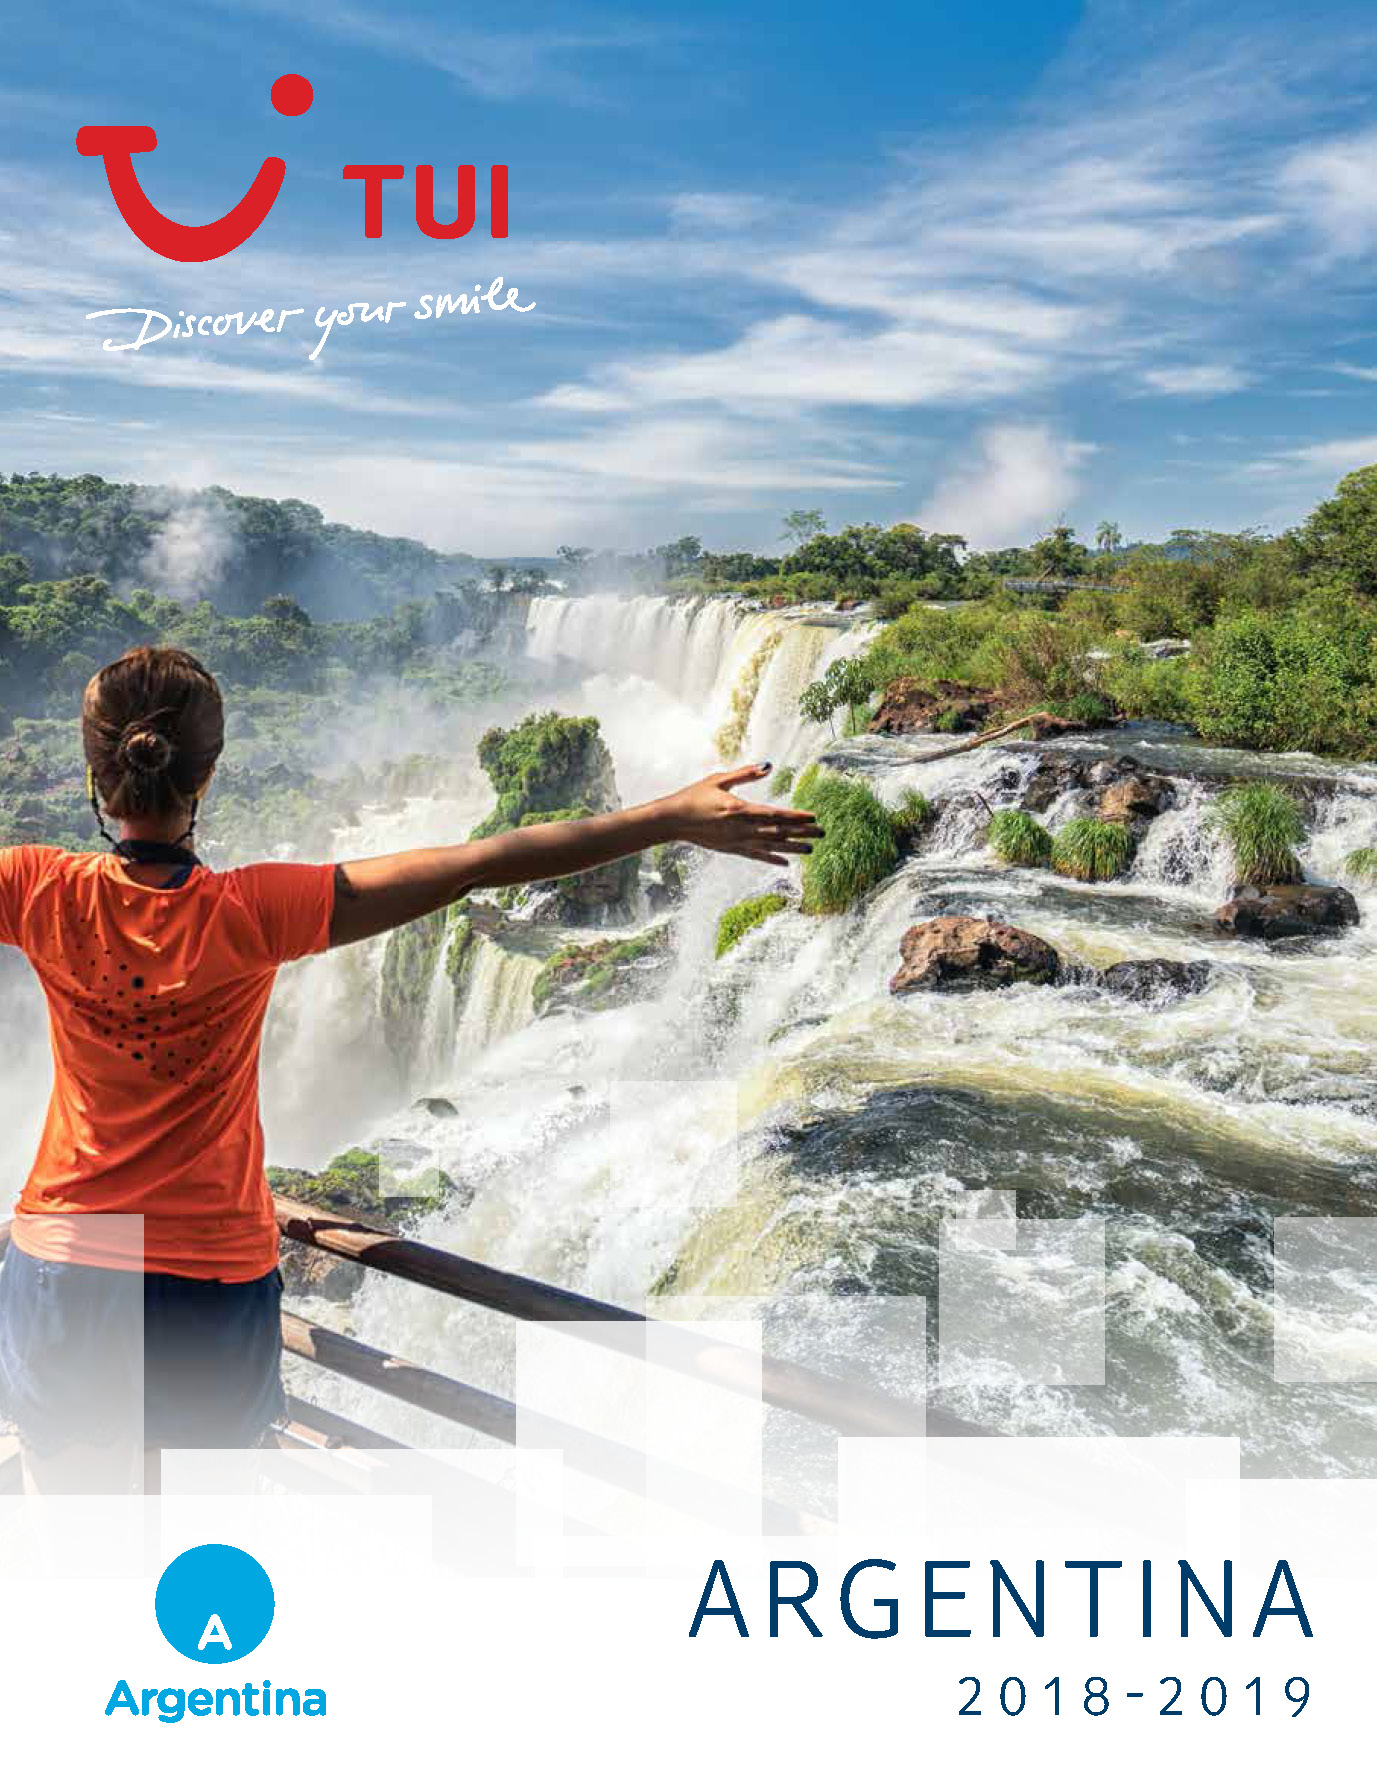 Catalogo TUI Ambassador Tours Argentina 2018-2019